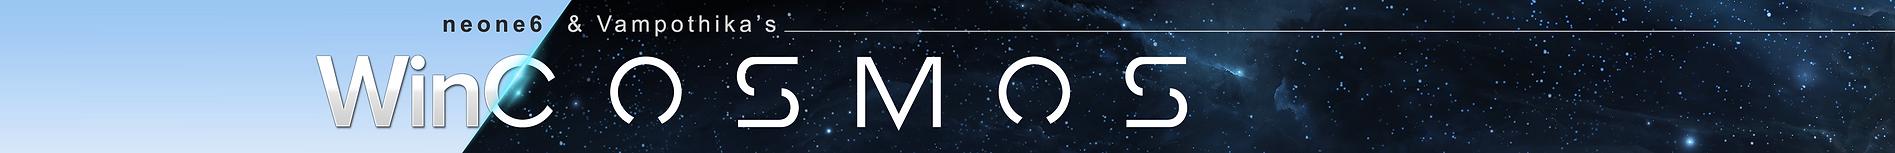 WinCosmos Logo Header.png